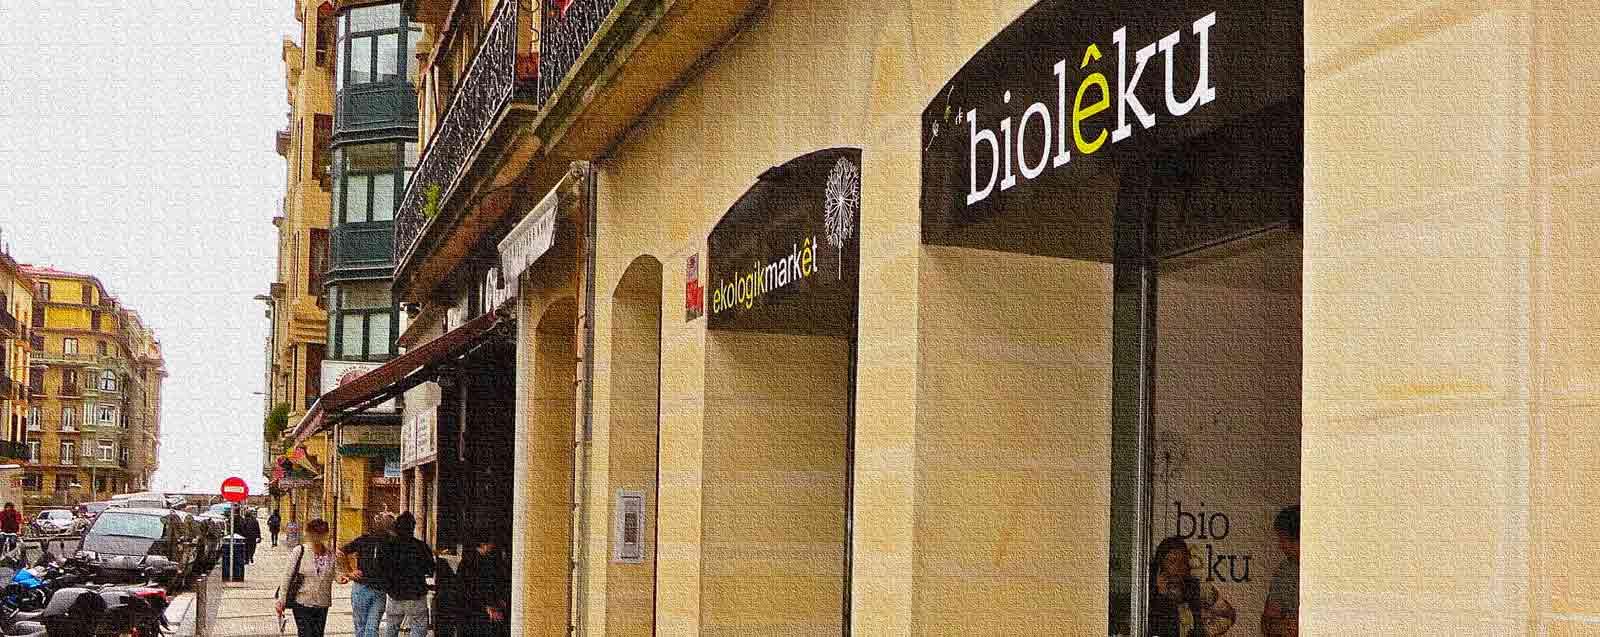 BioLeku ekologikmarket Supermercado Biológico en Donostia San Sebastián